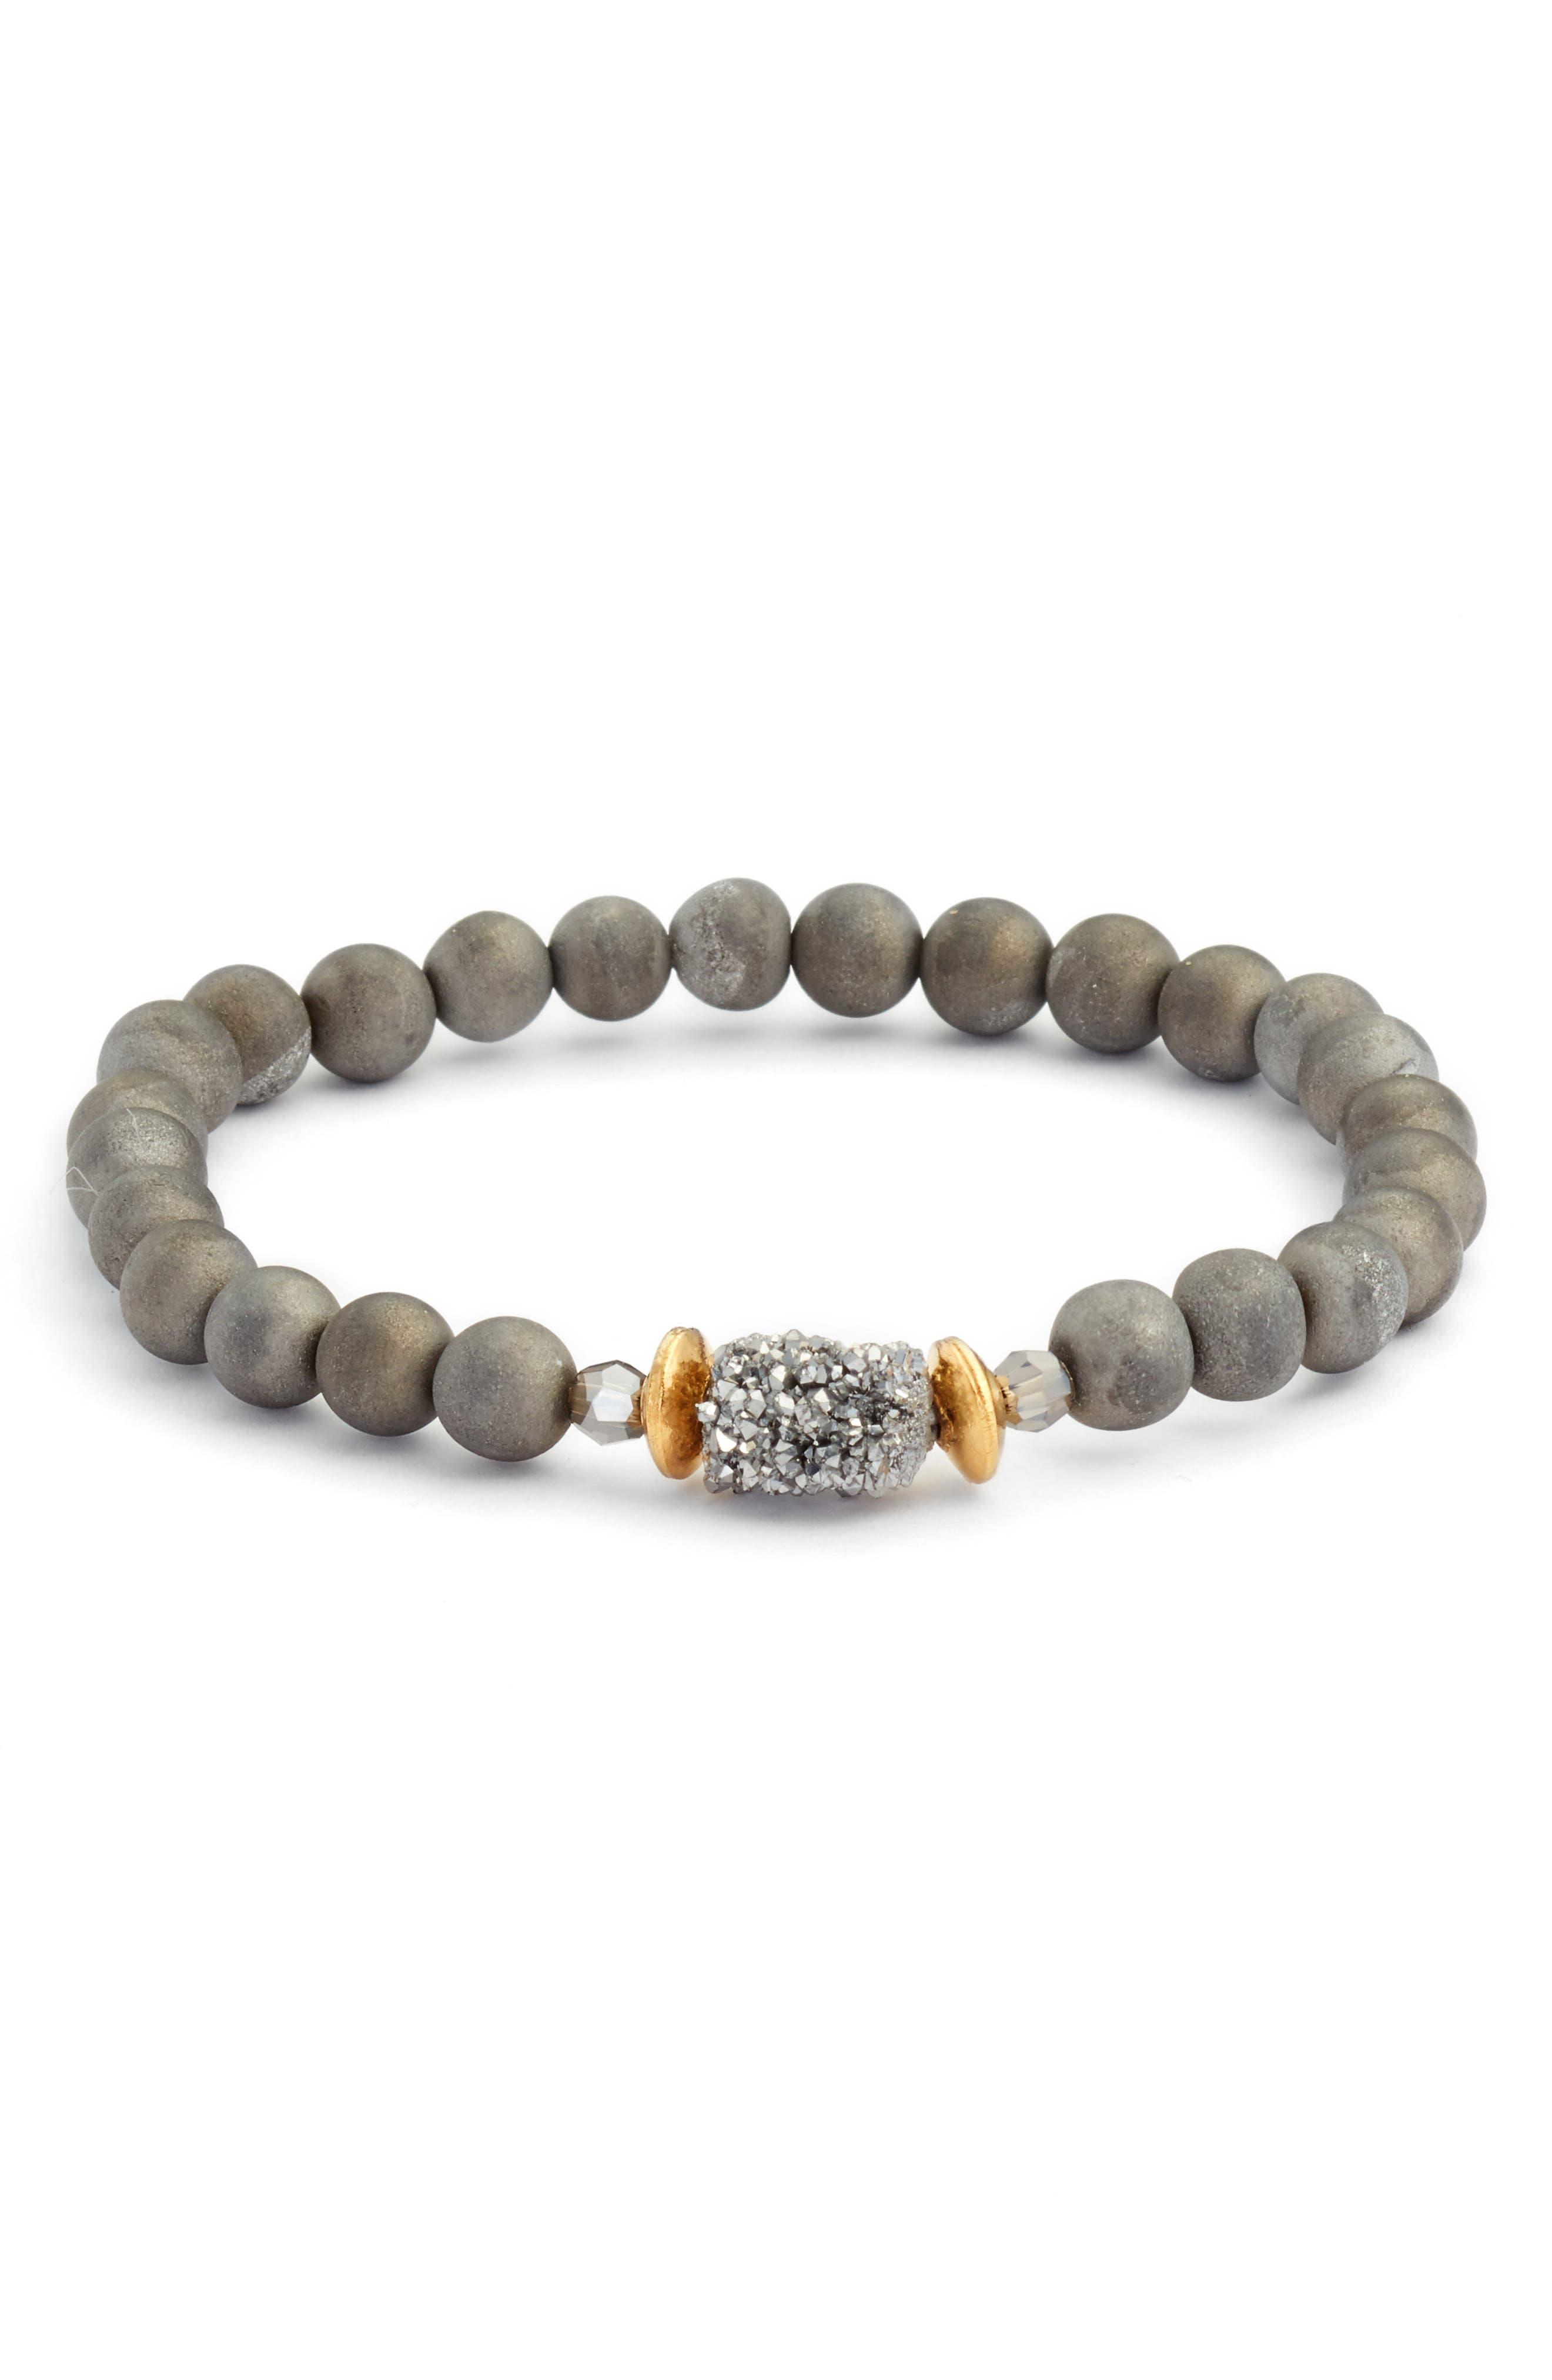 Agate Stretch Bracelet,                             Main thumbnail 1, color,                             Silver Agate Mix